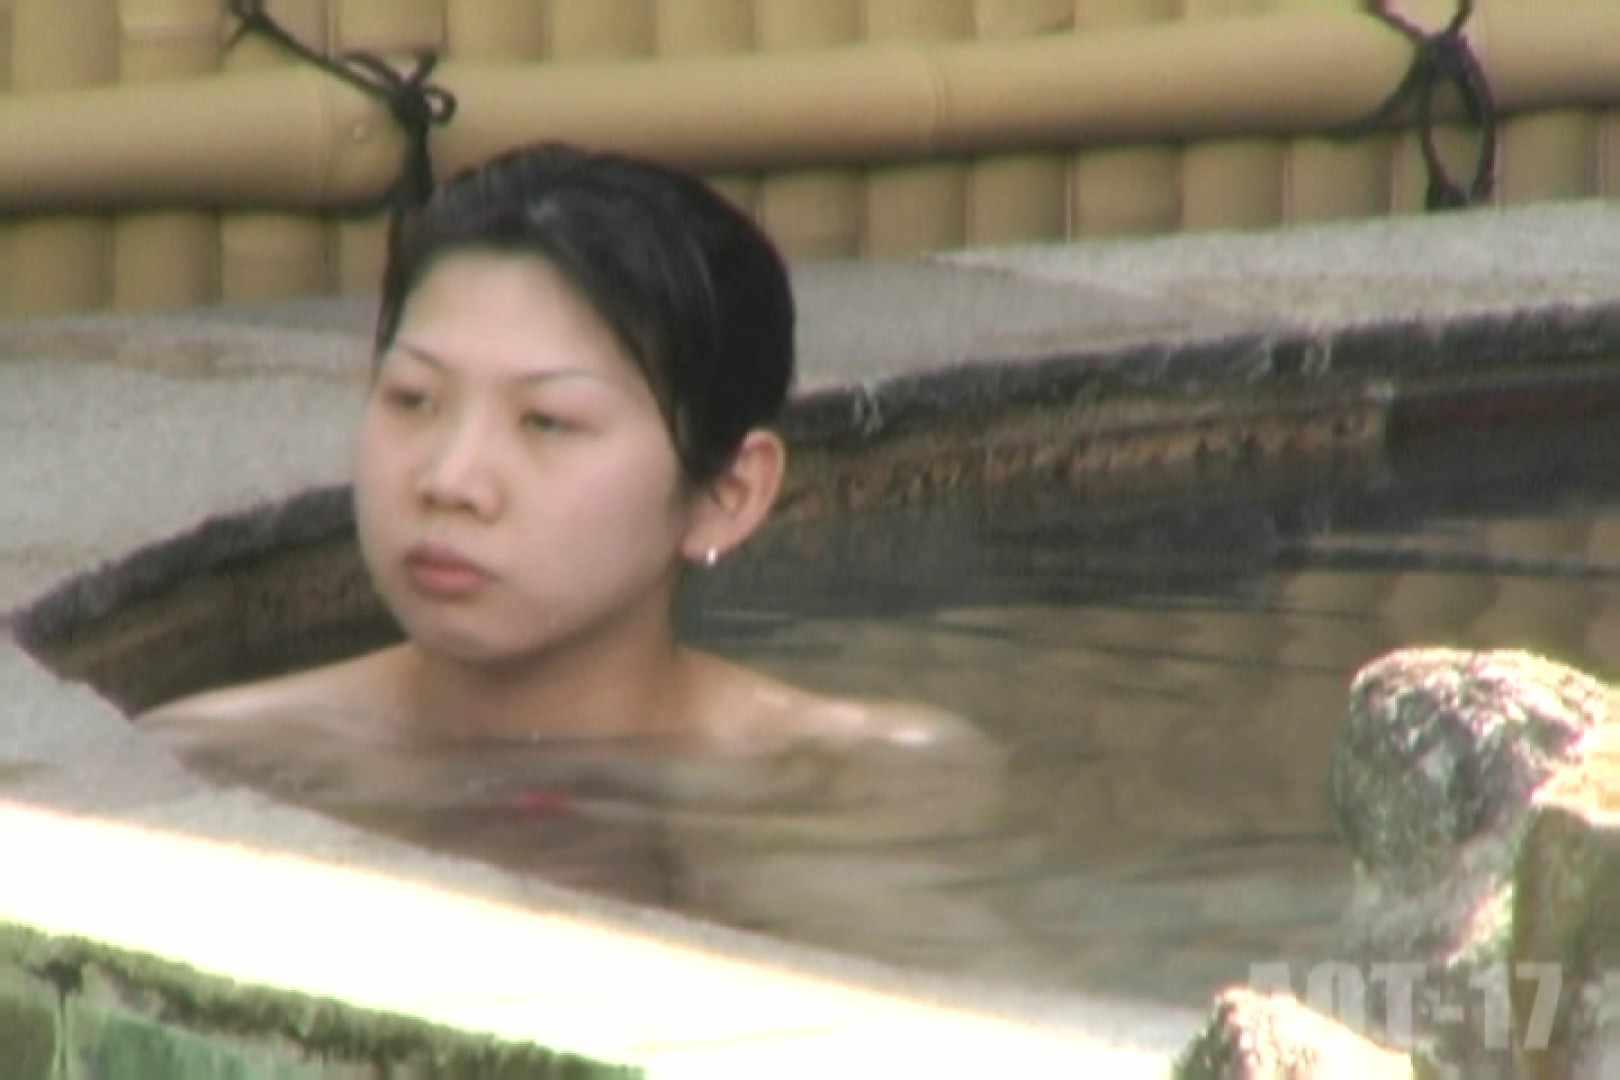 Aquaな露天風呂Vol.850 盗撮 AV無料動画キャプチャ 76連発 8